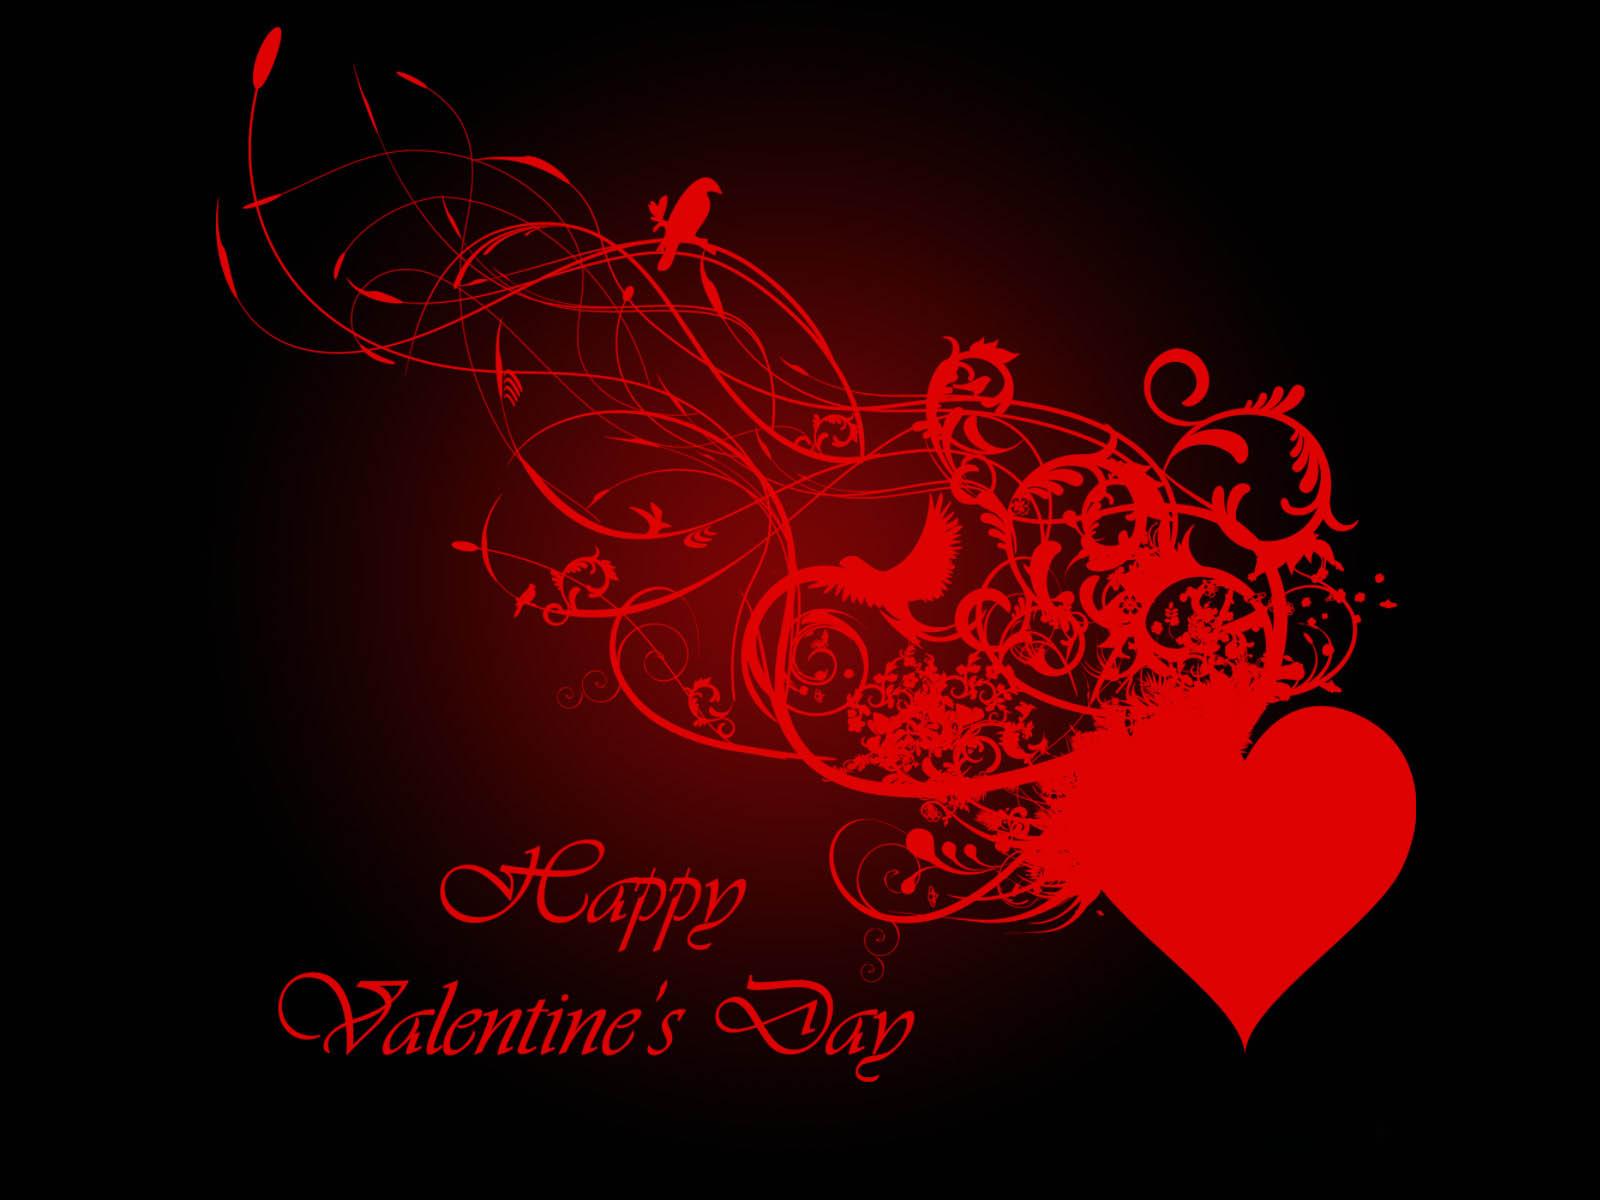 valentines day background wallpaper - photo #26